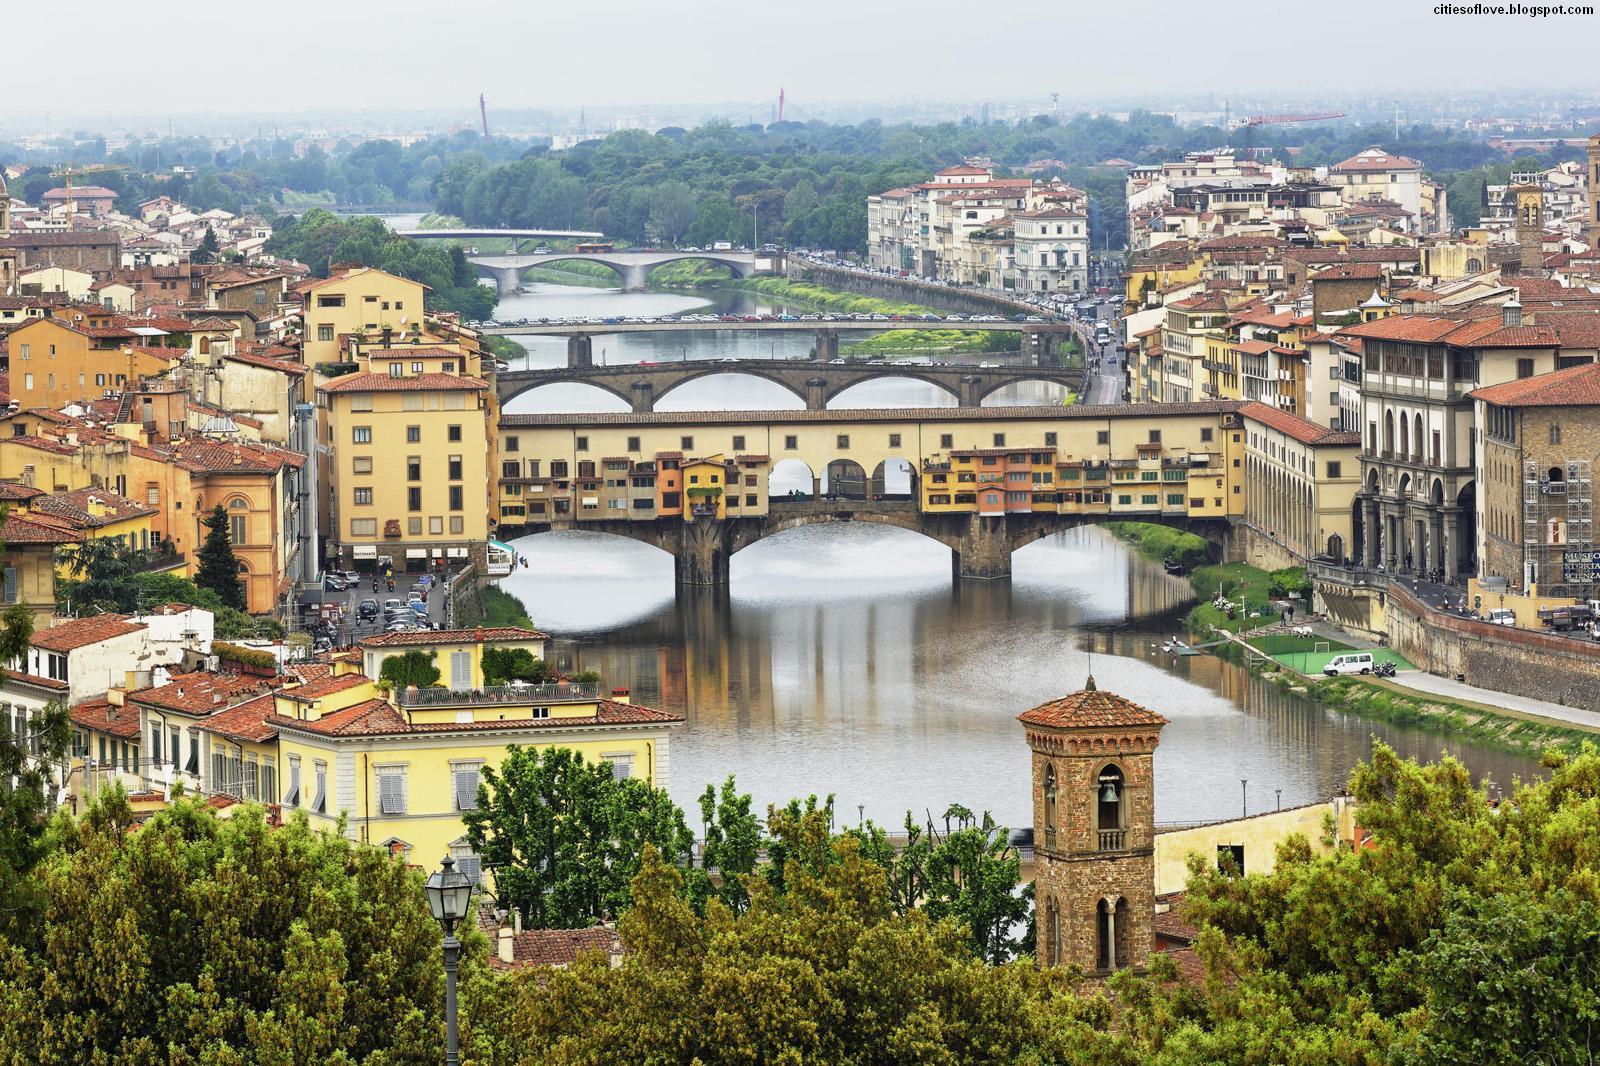 Ponte_Vecchio_Arno_River_in_Florence_Italy_daytime.jpg